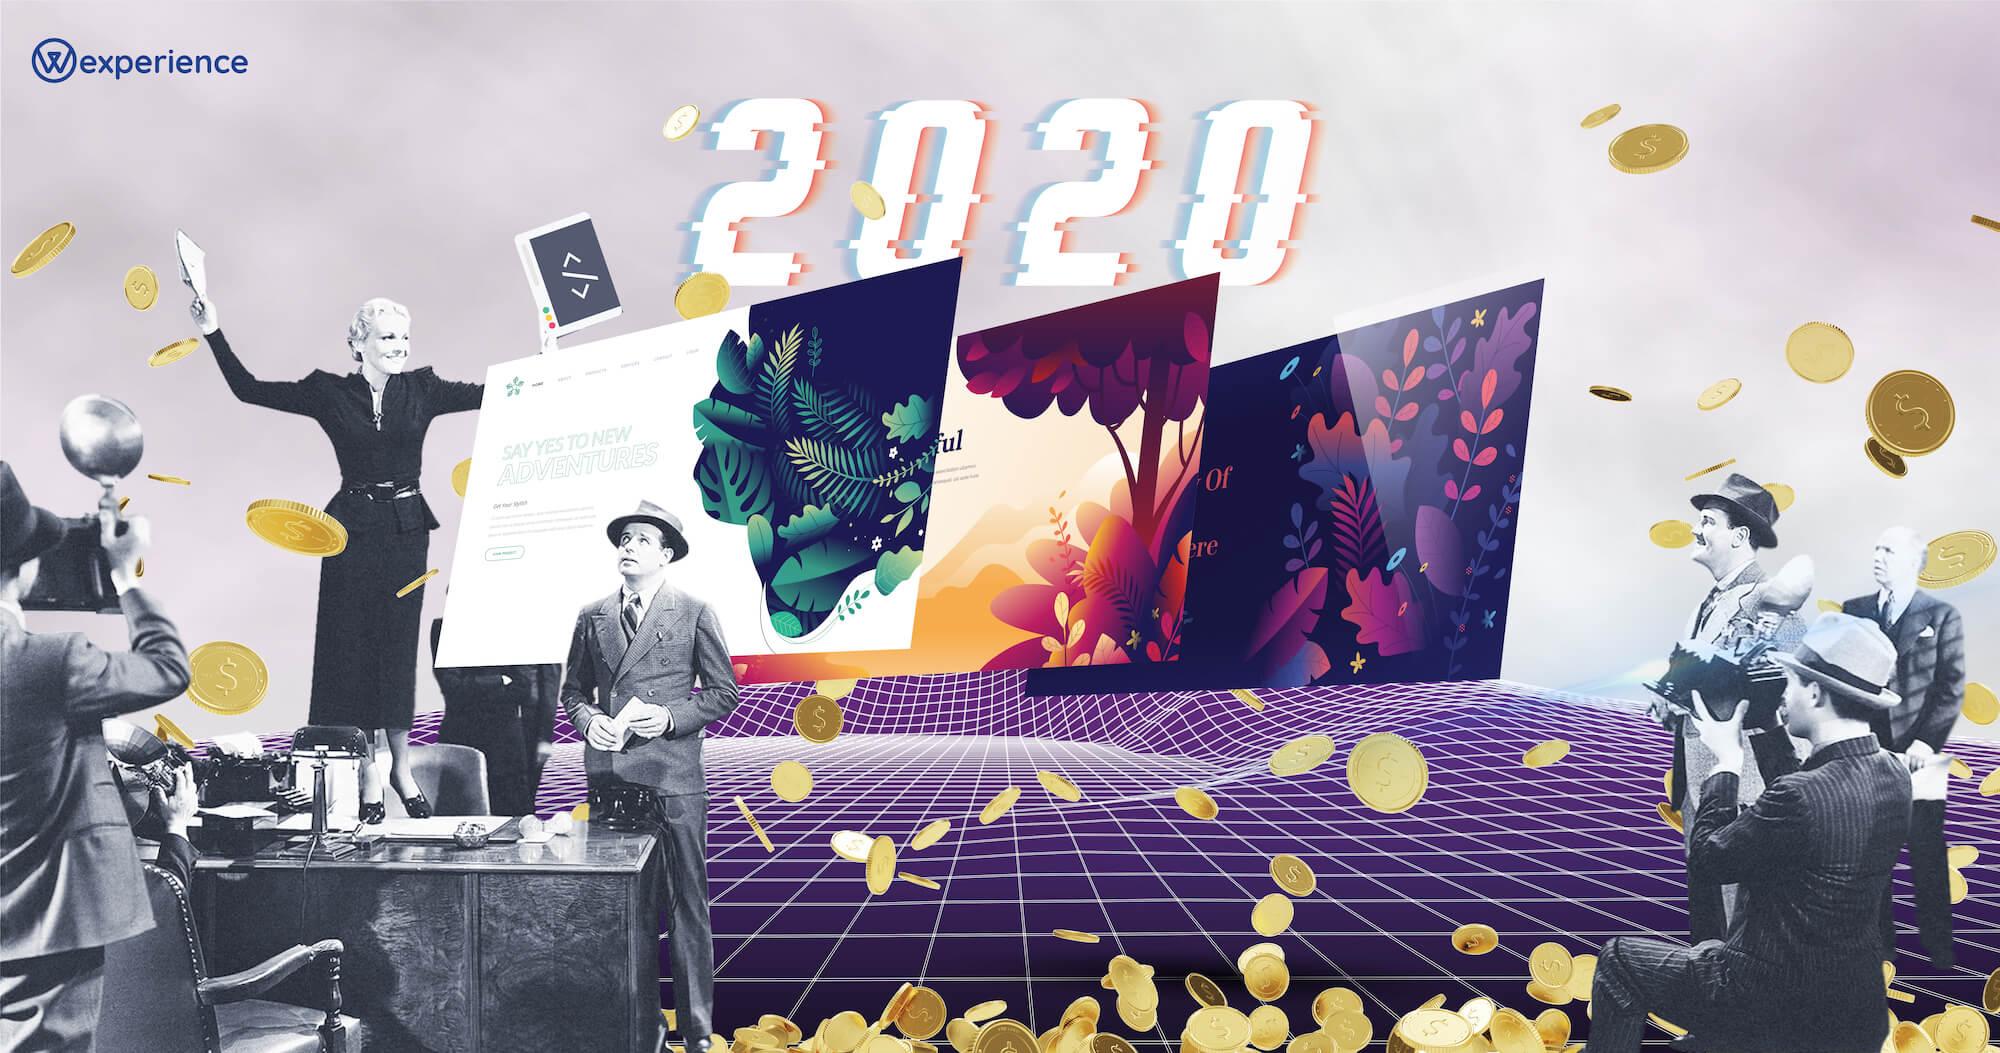 High Conversion Web Design 2020: สร้างเว็บไซต์อย่างไรให้เพิ่มยอดมากกว่าที่เคย ฉบับ 2020